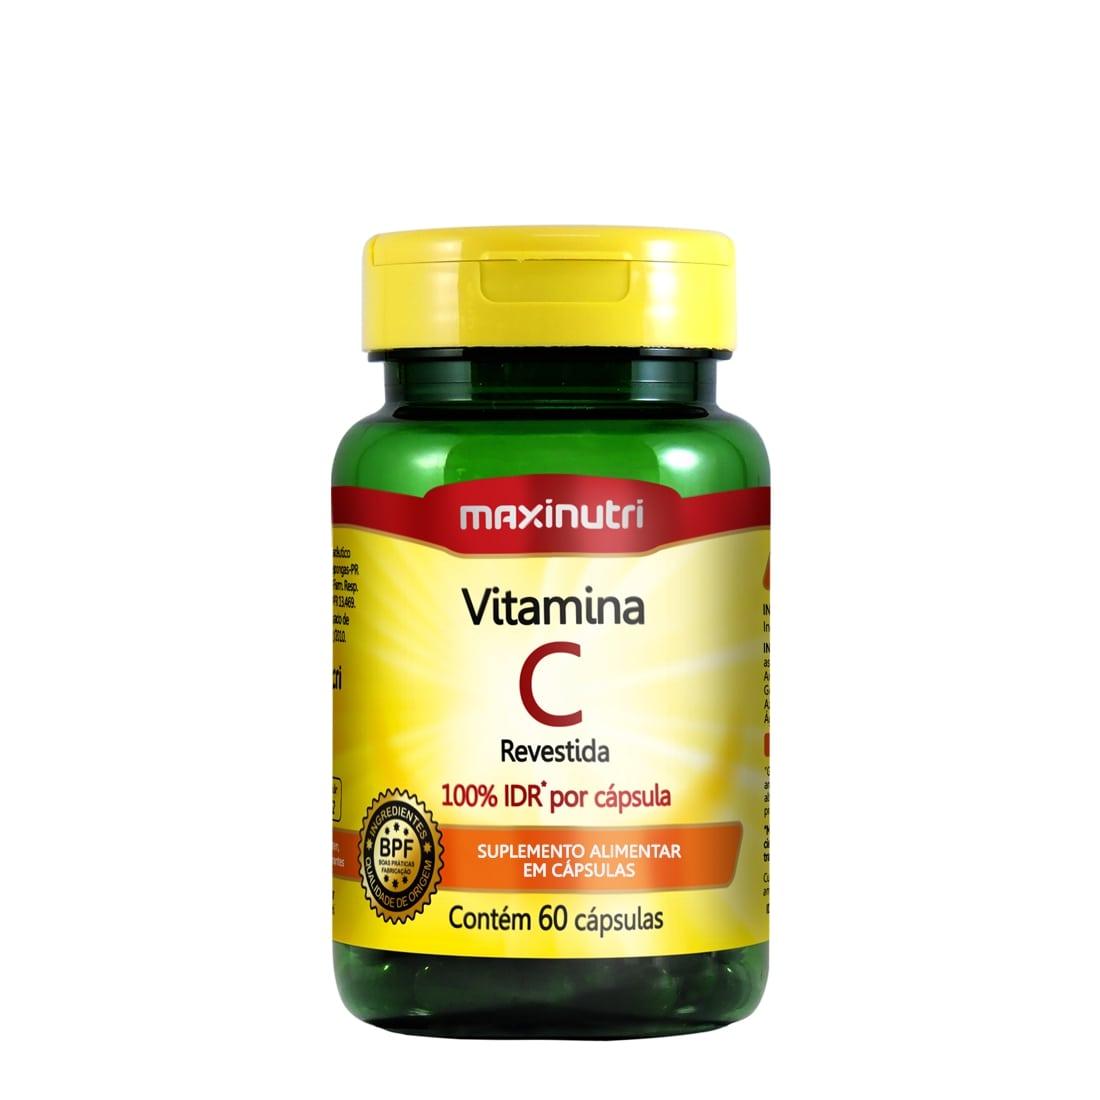 Vitamina C Revestida 60 Cápsulas Maxinutri